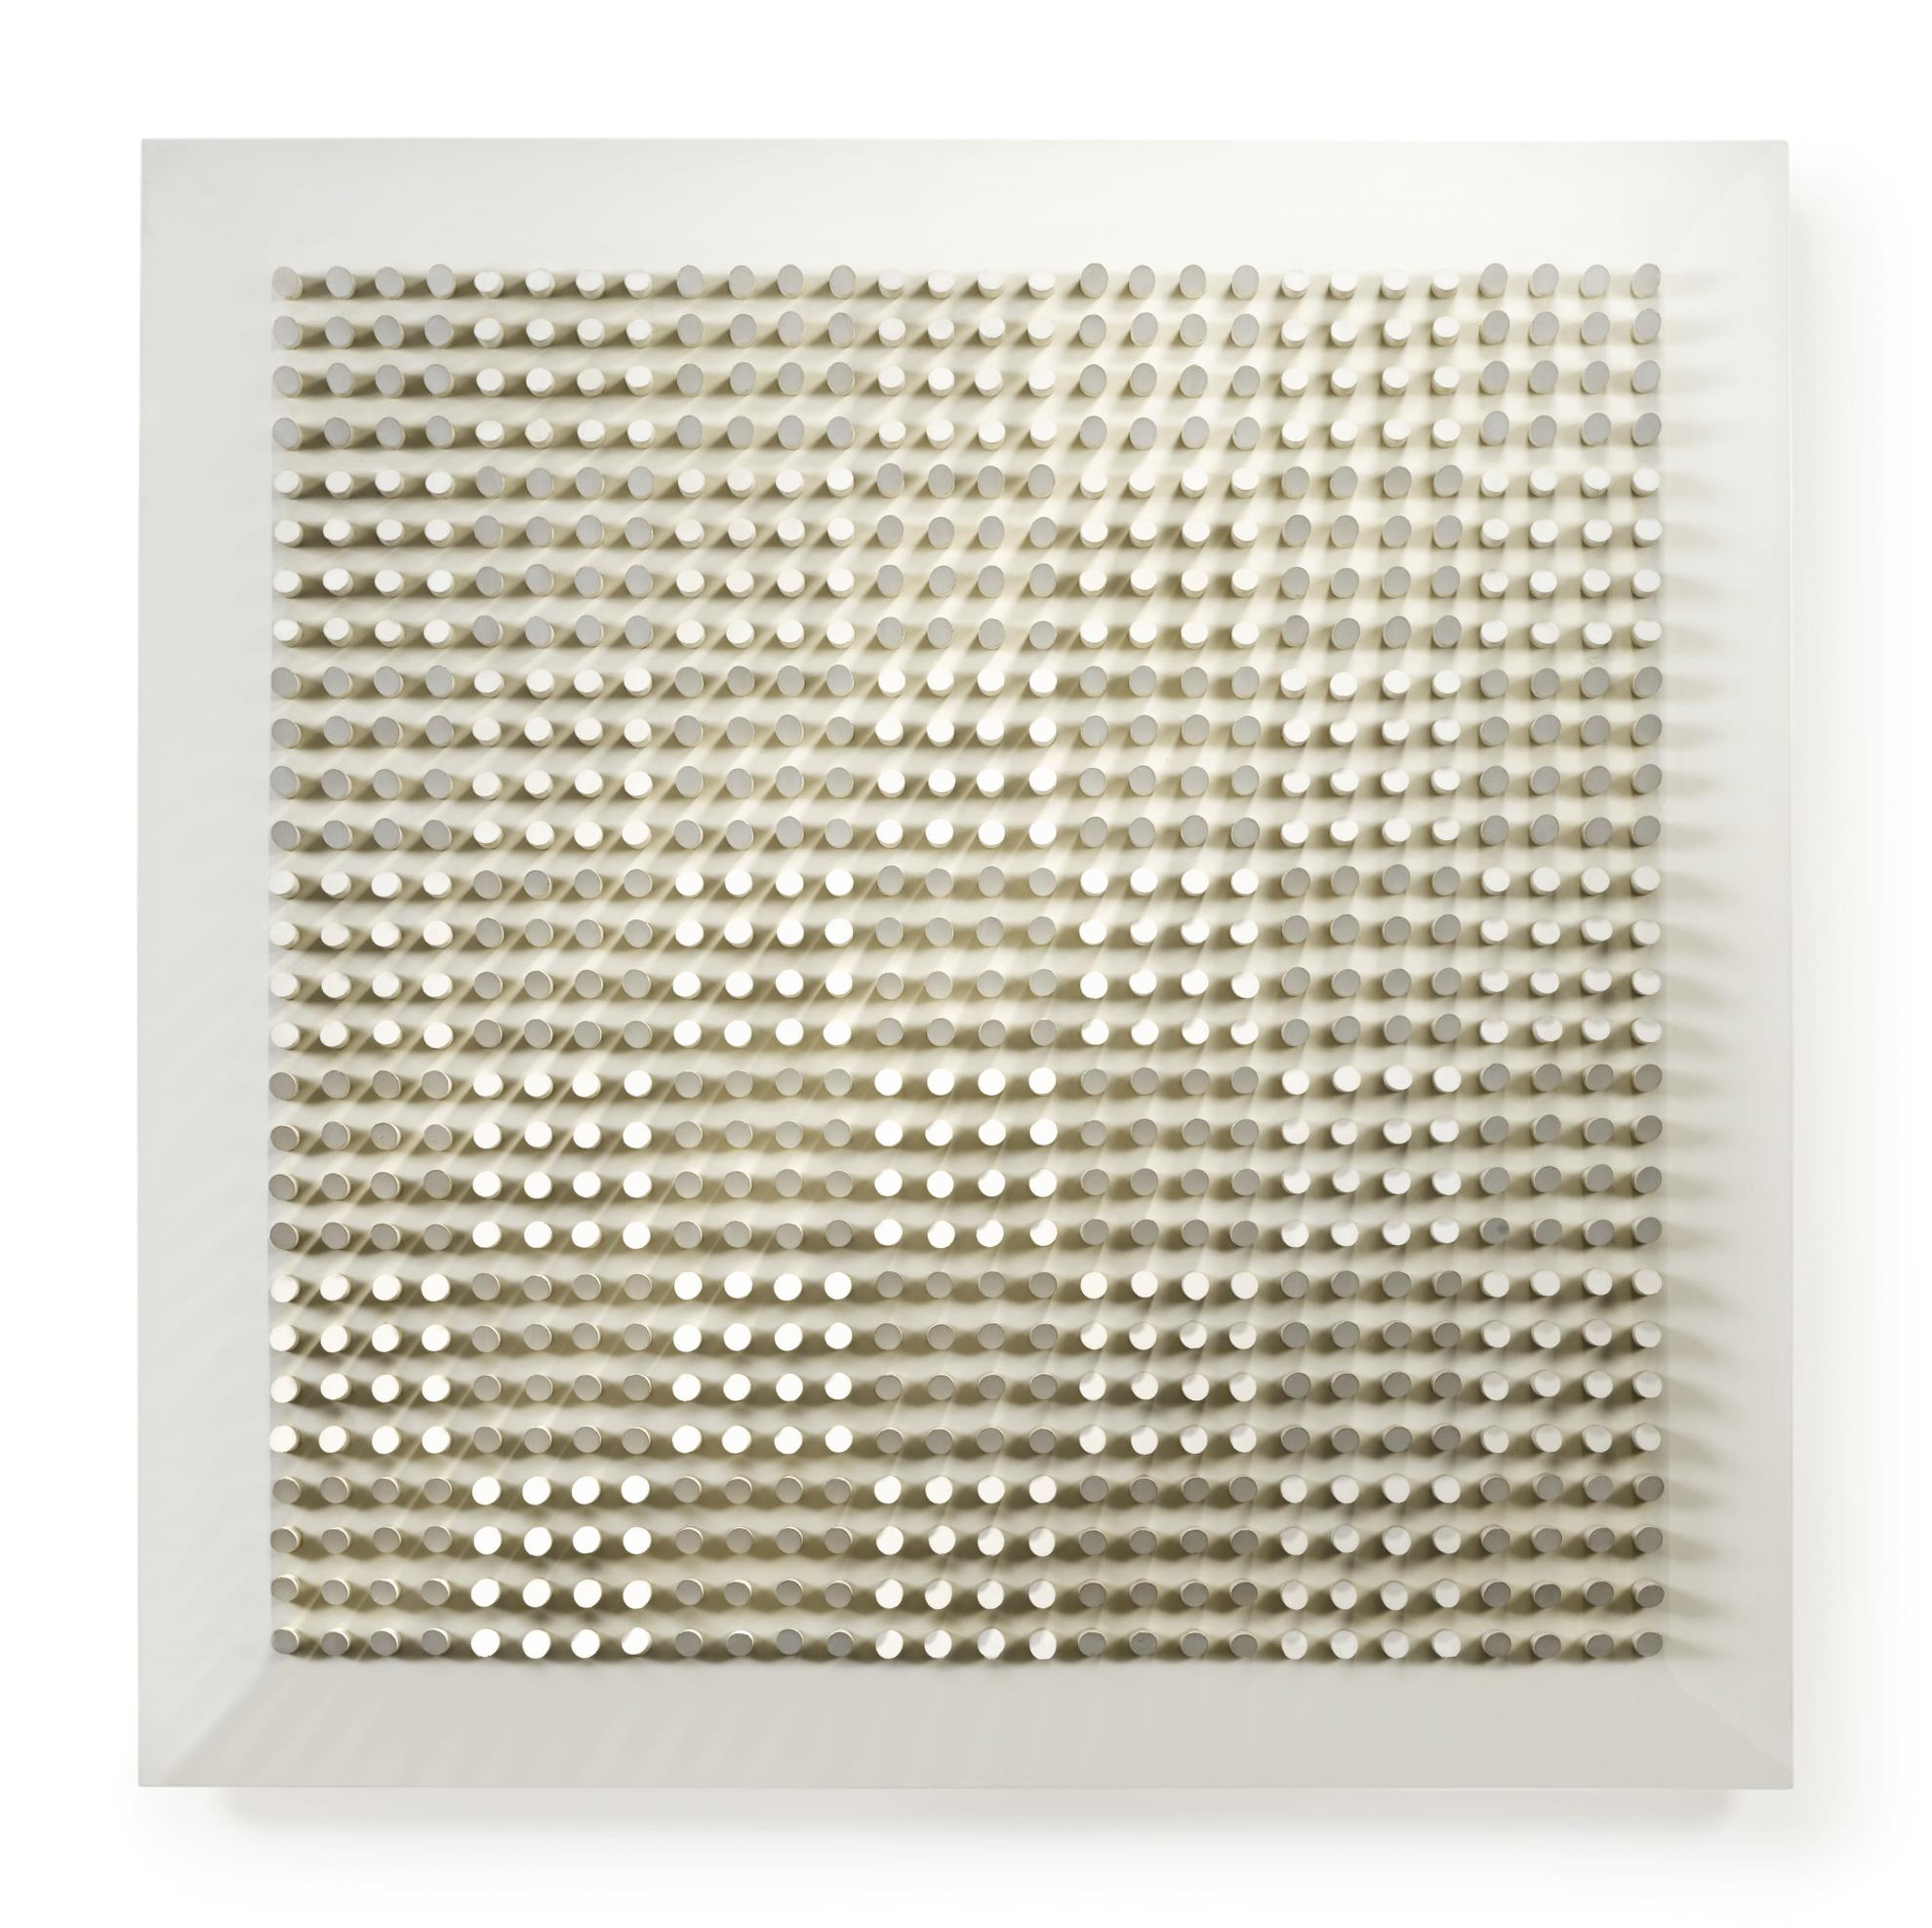 Luis Tomasello-Objet Plastique No. 134-1964